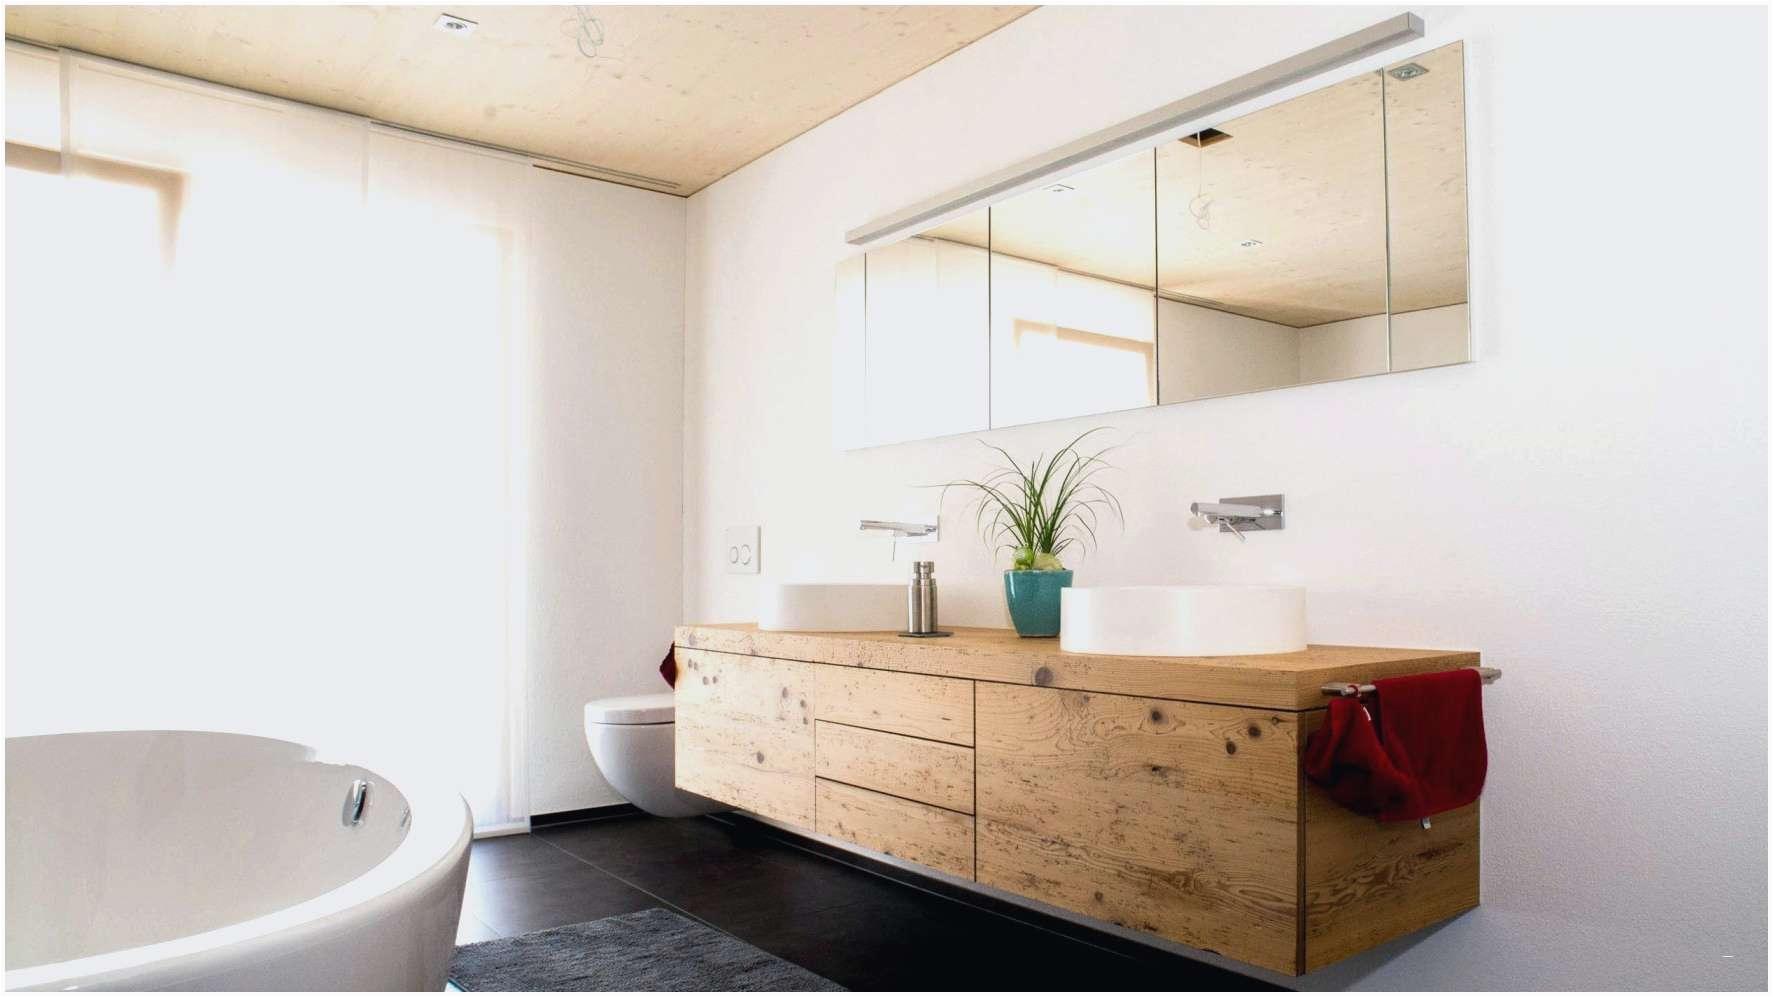 badezimmer ideen ikea mit le meilleur de 30 einzigartig bad ideen ikea pour meilleur 61 und lampe design ikea holzhaus bausatz kaufen genial badezimmer ideen holz frisch holzmobel badezimmer 0d archiv